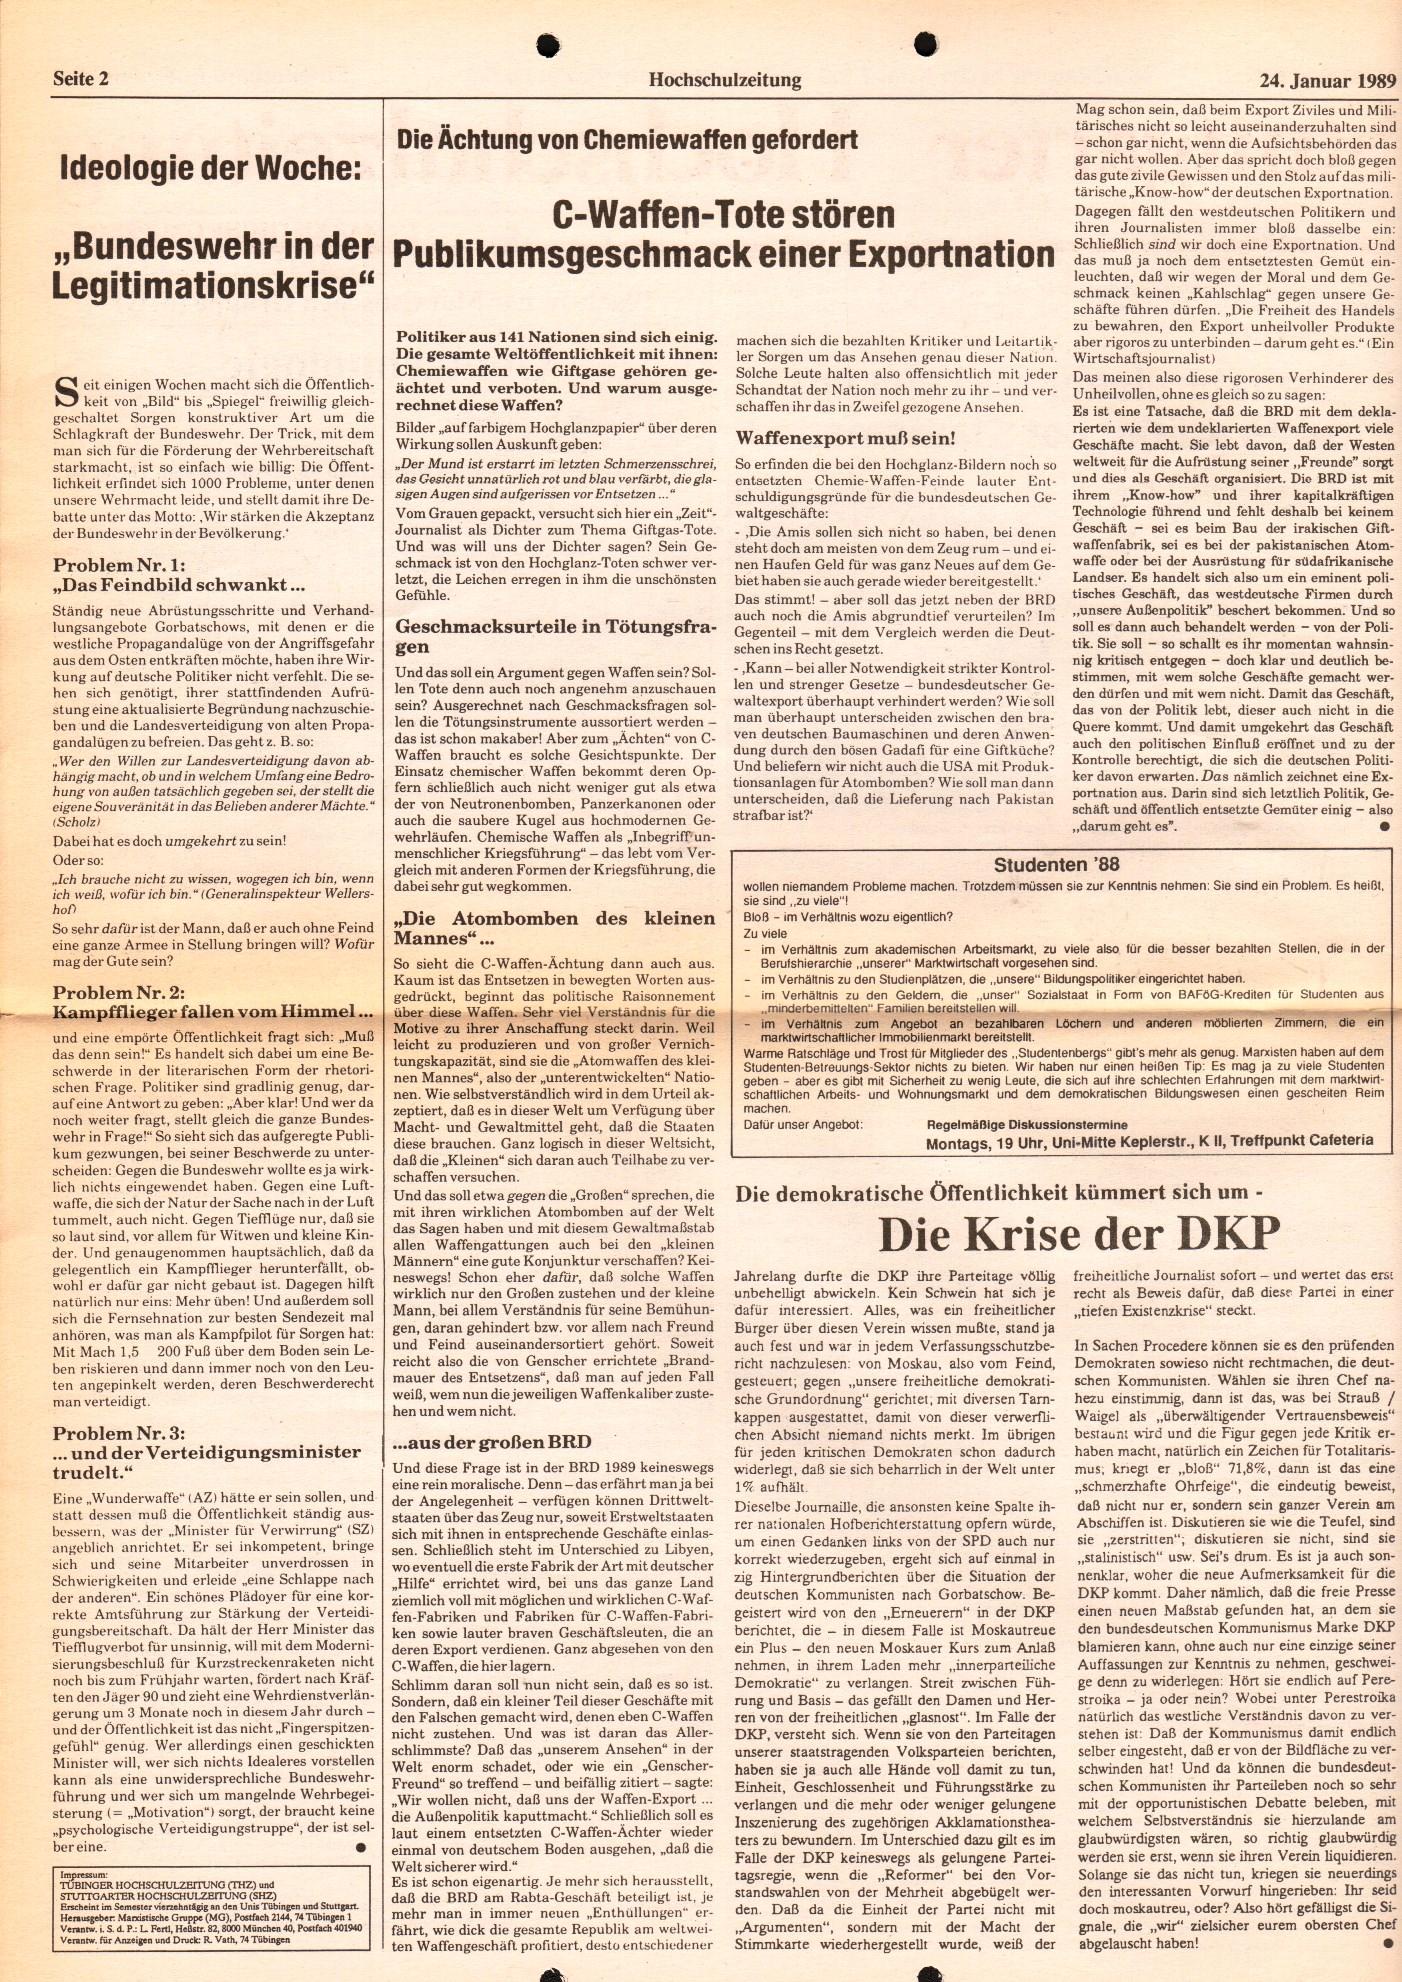 Stuttgart_MG_Hochschulzeitung_1989_02_02